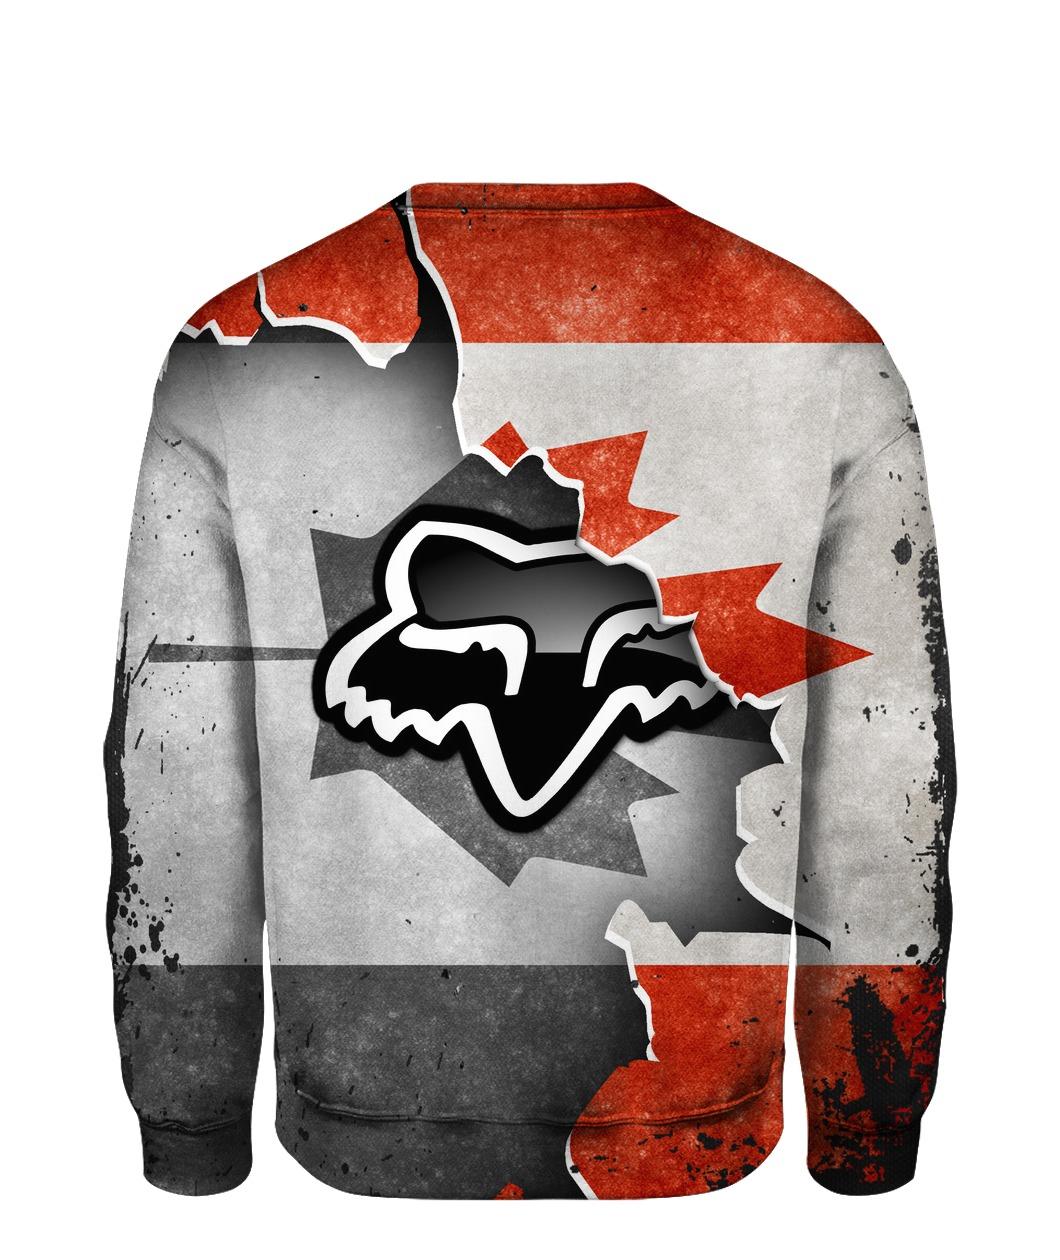 Fox racing in canada flag full printing sweatshirt 1